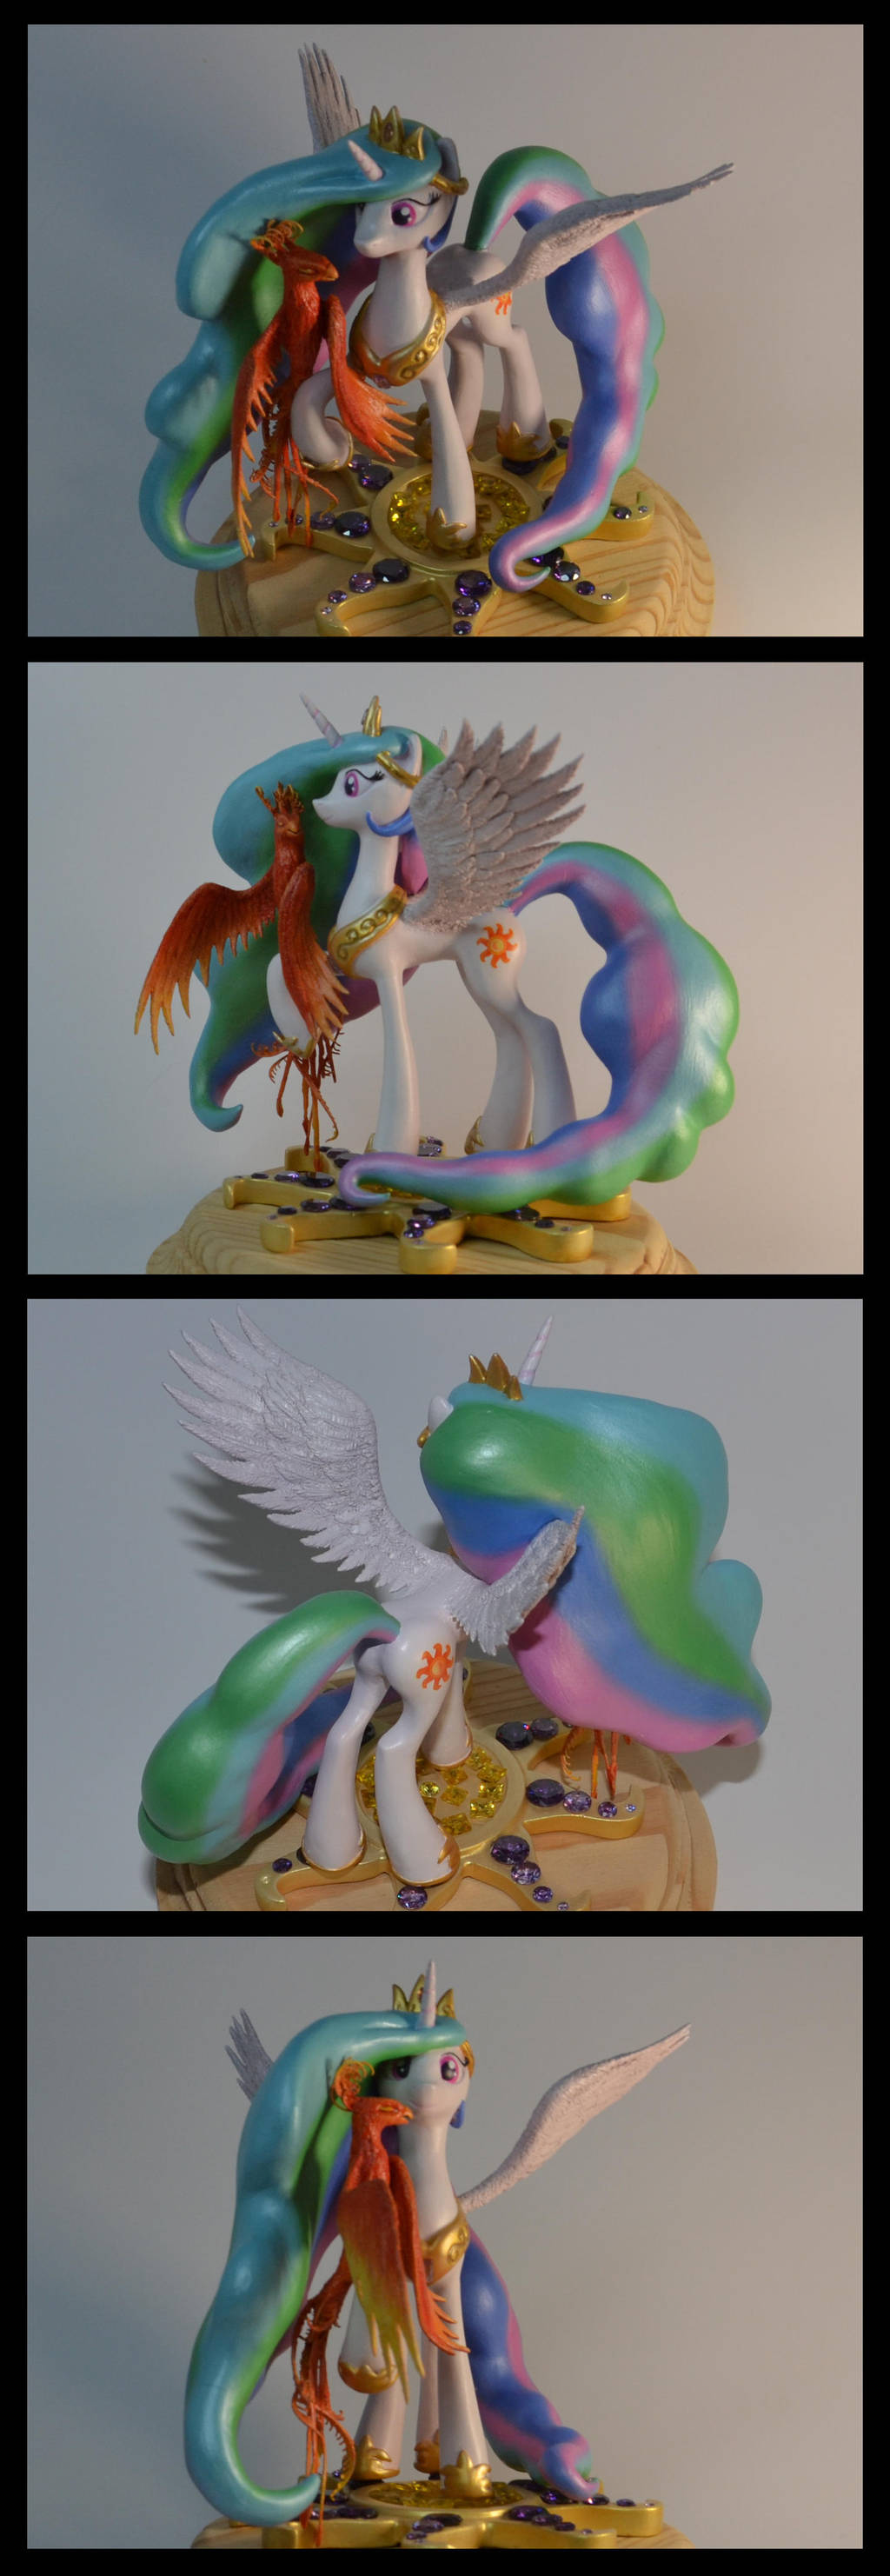 MLP:FIM Celestia sculpture by CaptainWilder